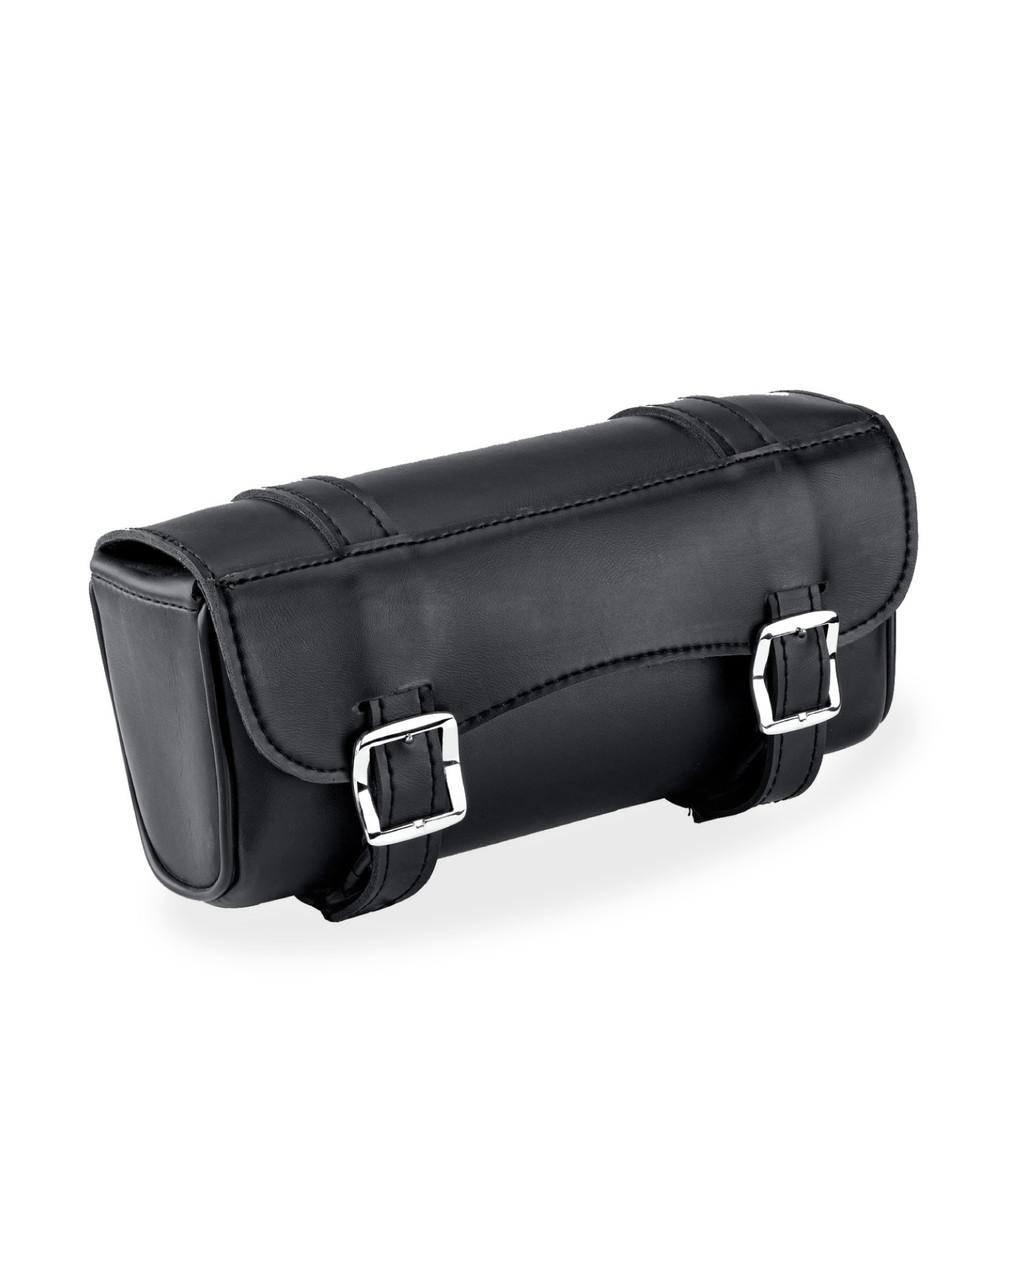 Honda Medium Universal Motorycycle Tool Bag Main Bag View